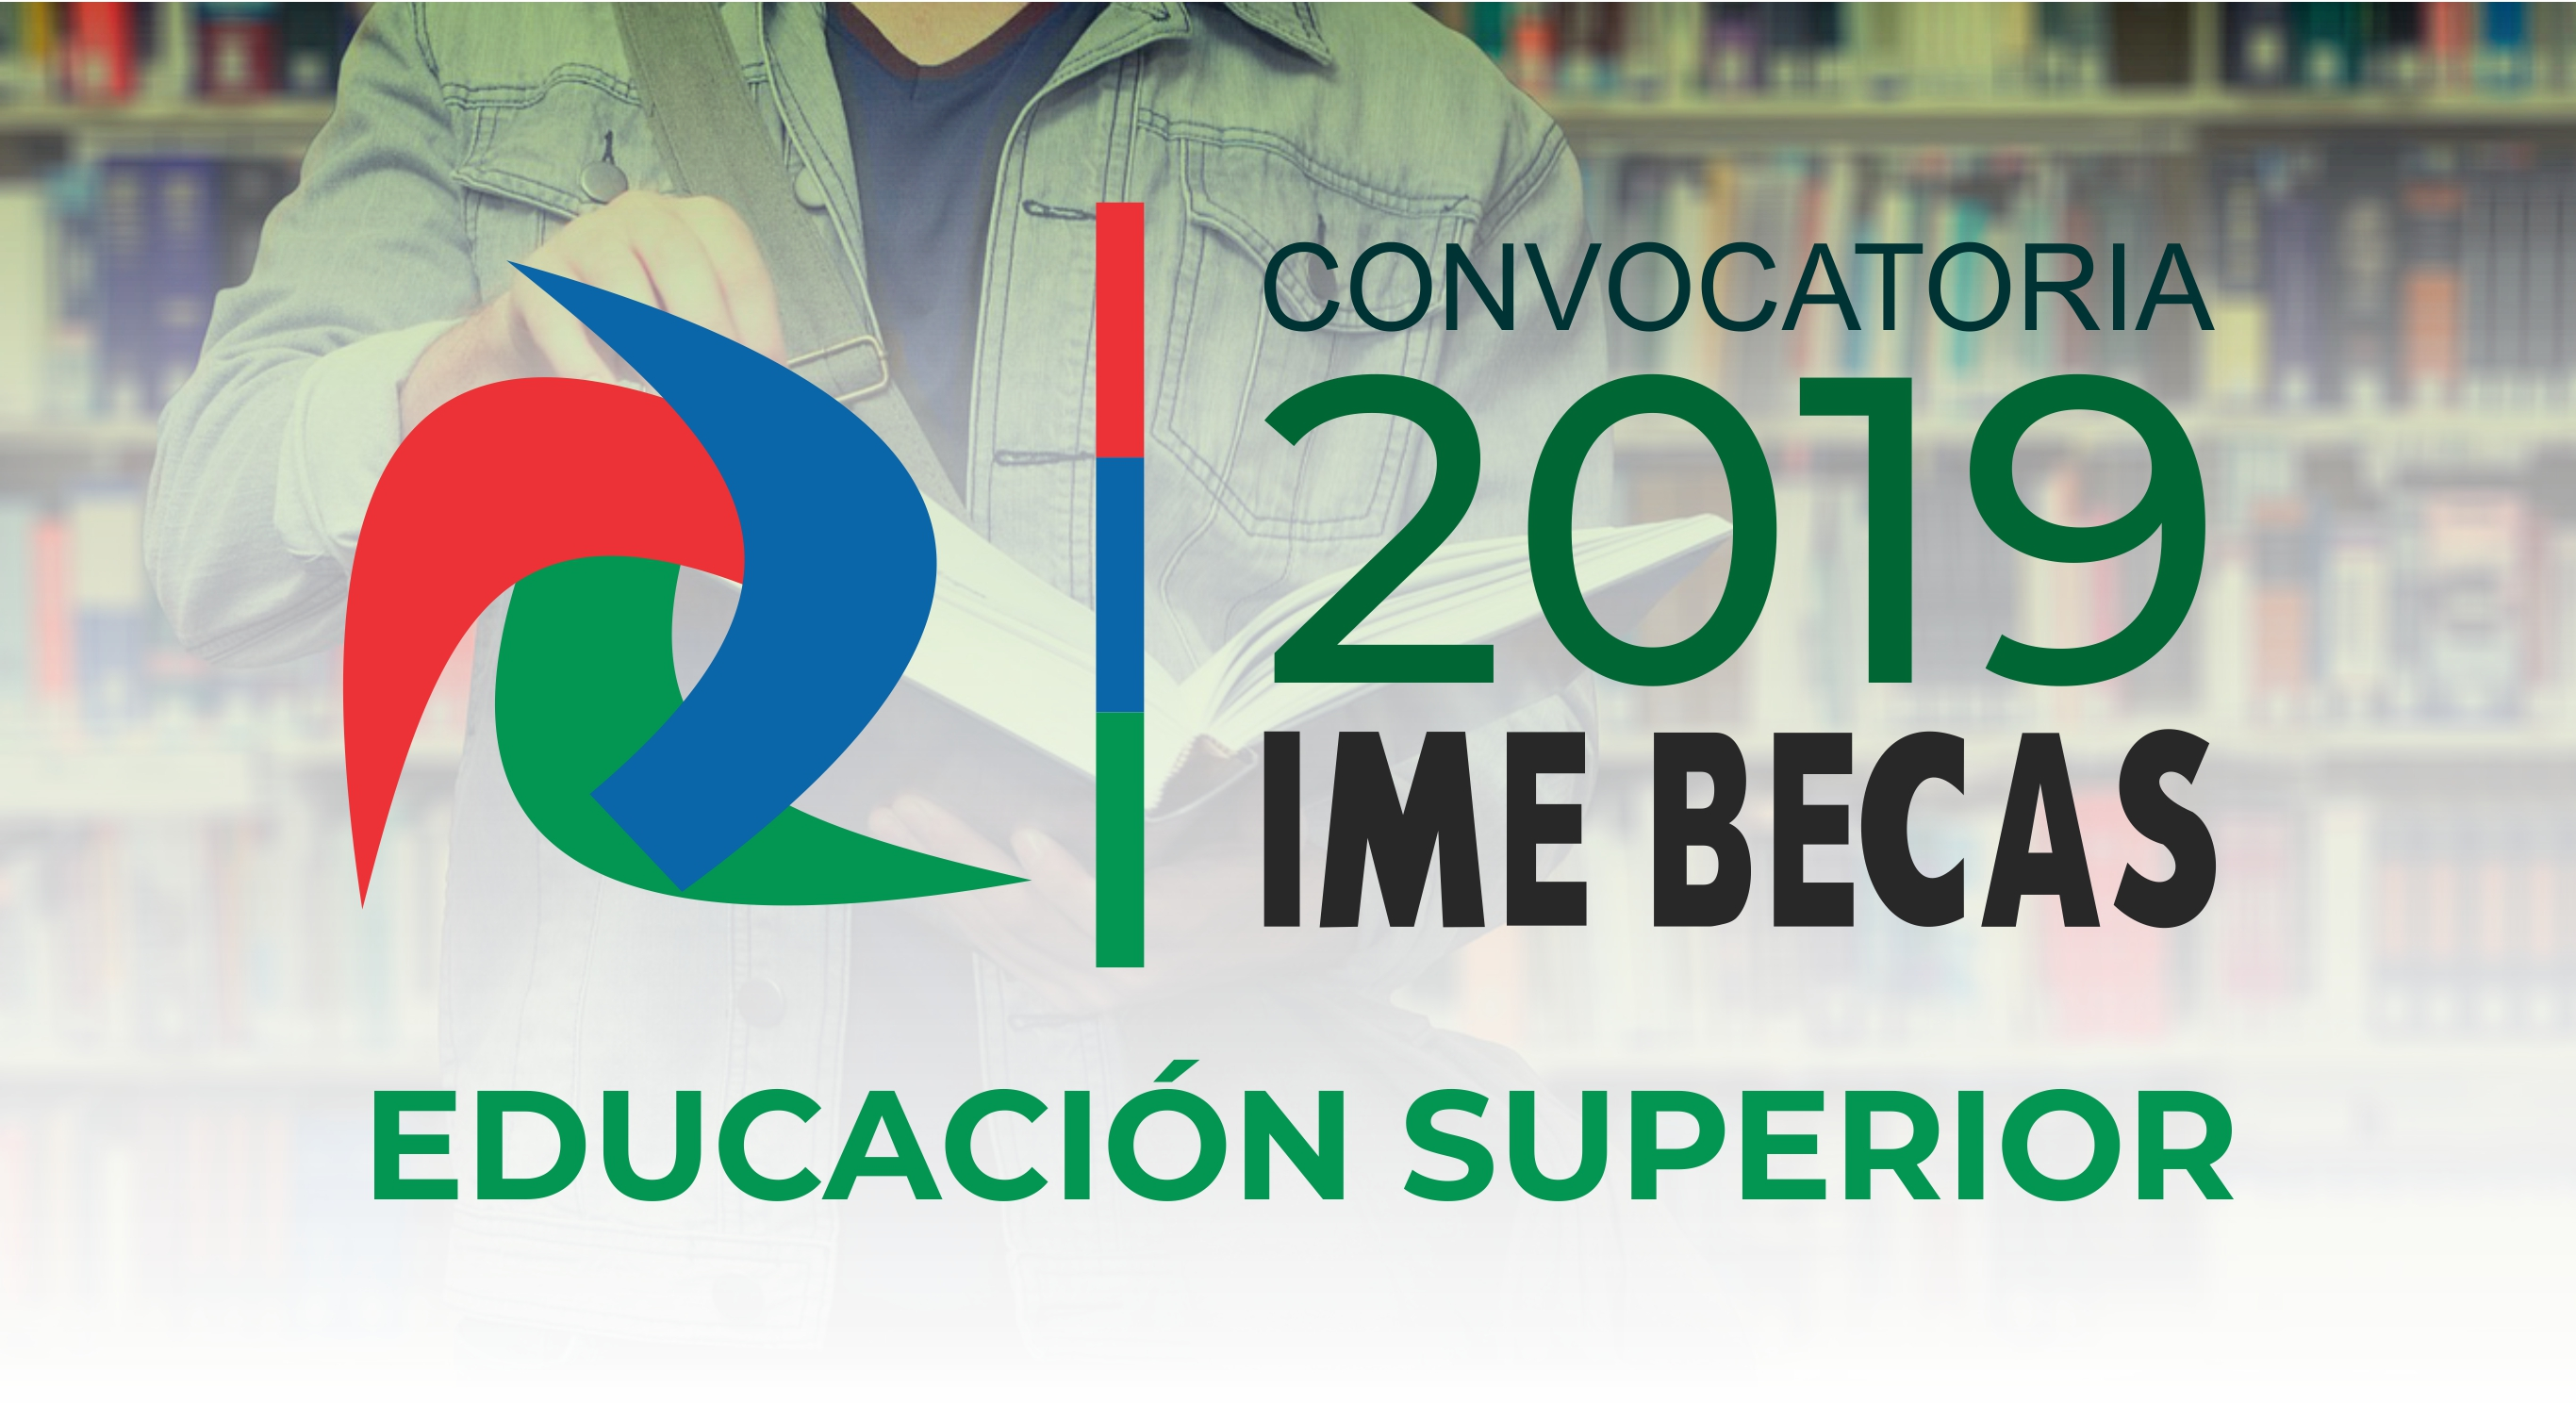 Convocatoria ime becas educaci n superior 2019 instituto - Instituto de los mexicanos en el exterior ...